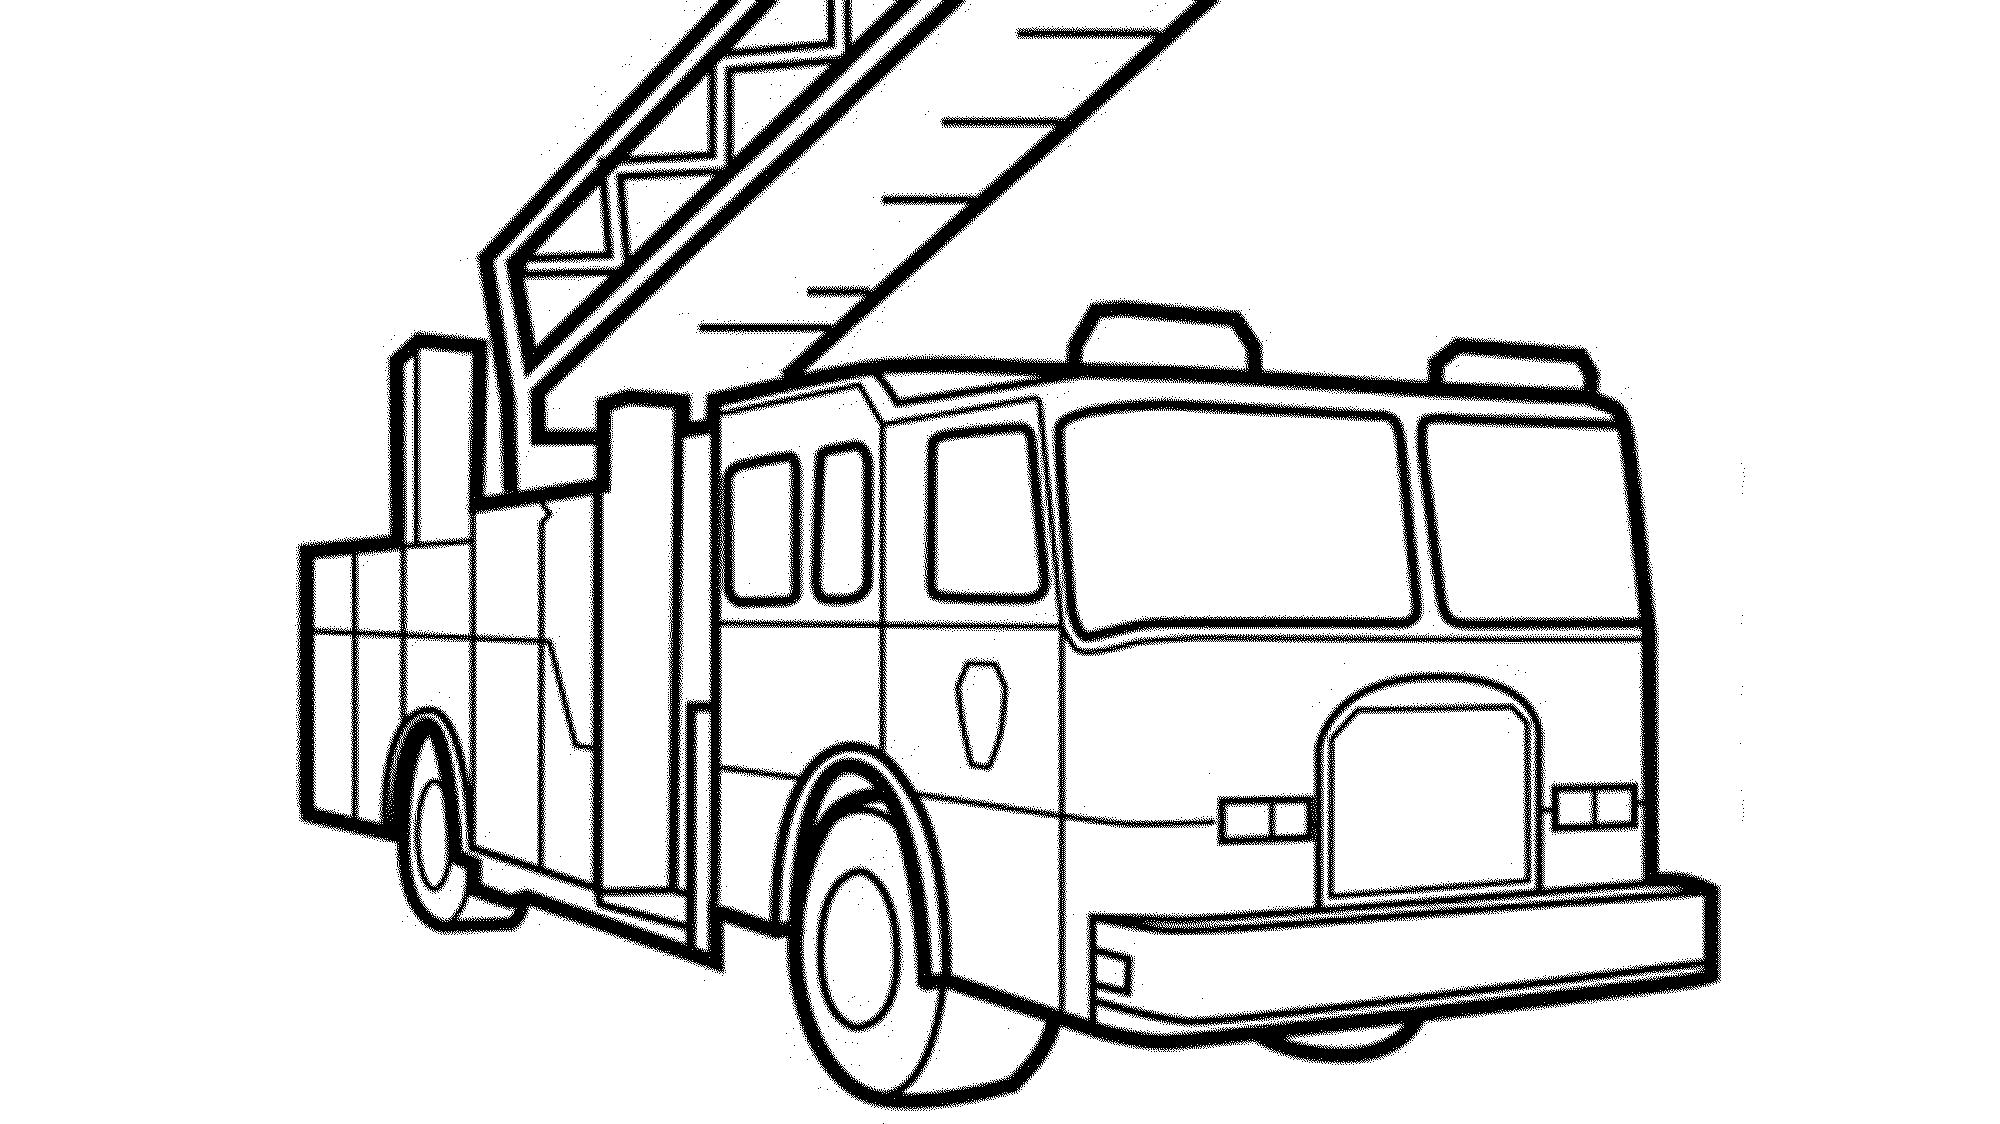 fire truck coloring page fire truck coloring pages getcoloringpagescom truck page coloring fire